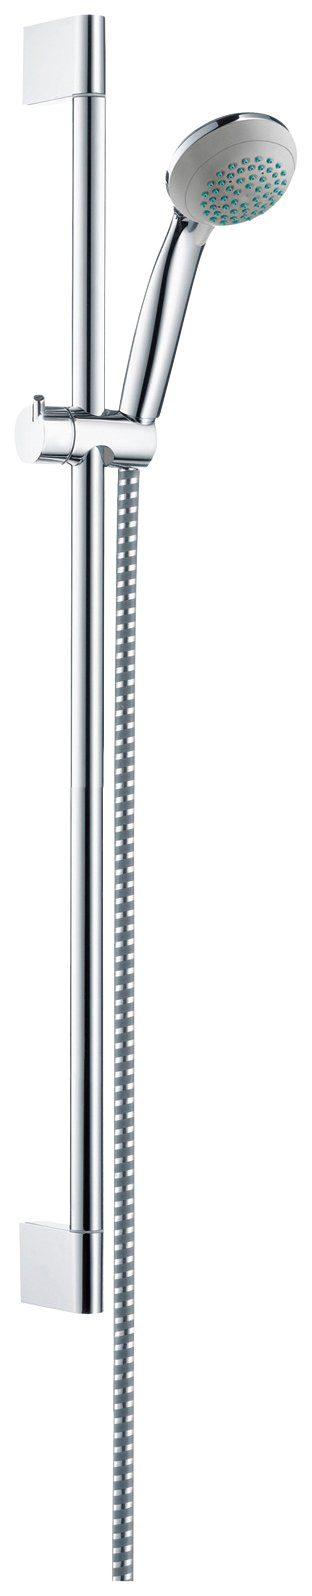 HANSGROHE Brausegarnitur »Crometta 85 Vario«